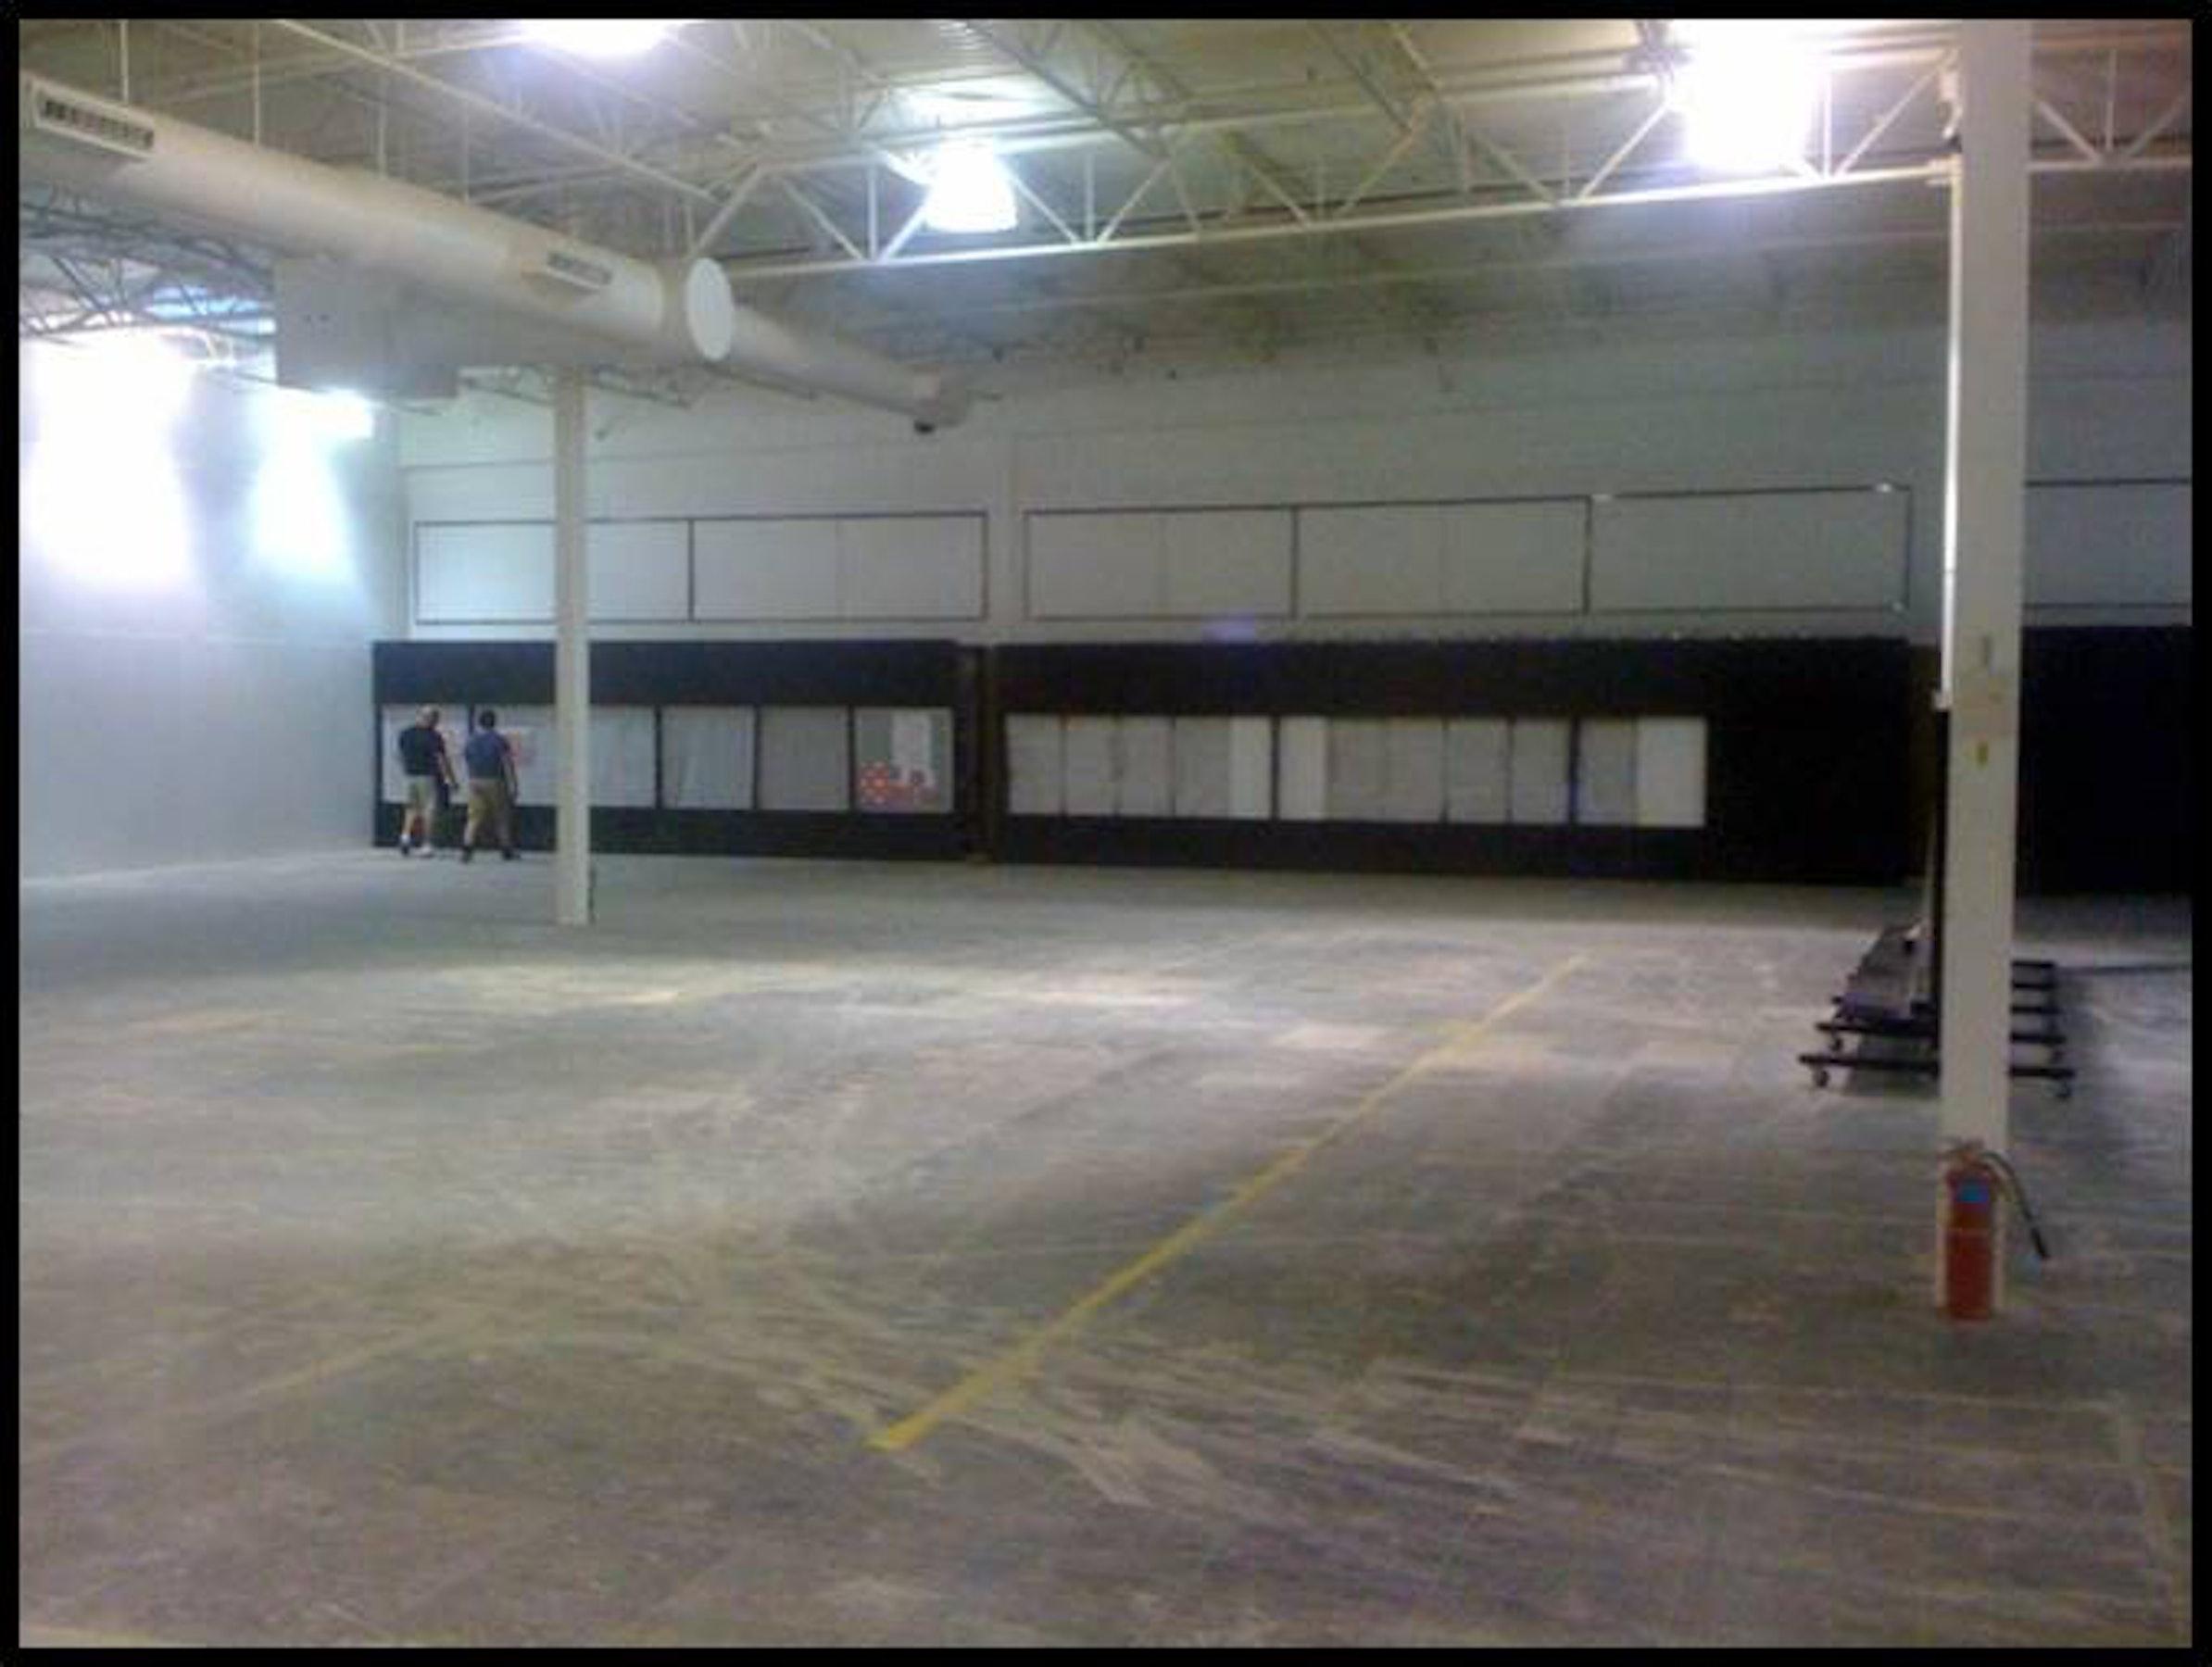 Texas Archery Academy in Beyond Dallas